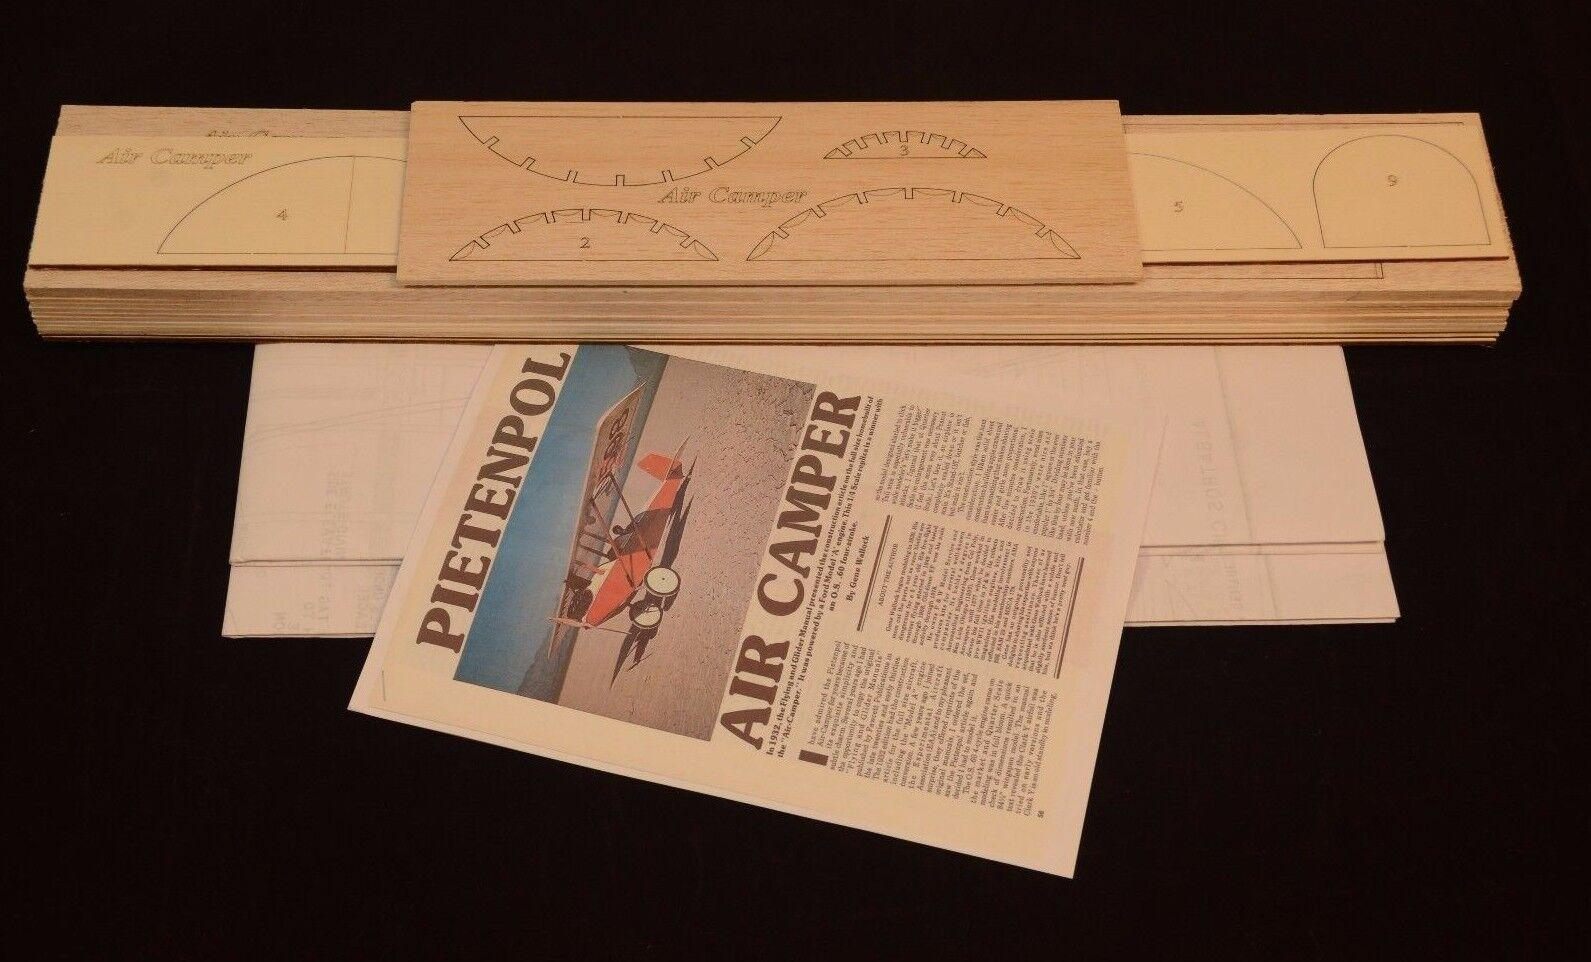 Giant 1 4 Scale Pietenpol Air Camper Laser Cut Short Kit & Plans 85  wing span